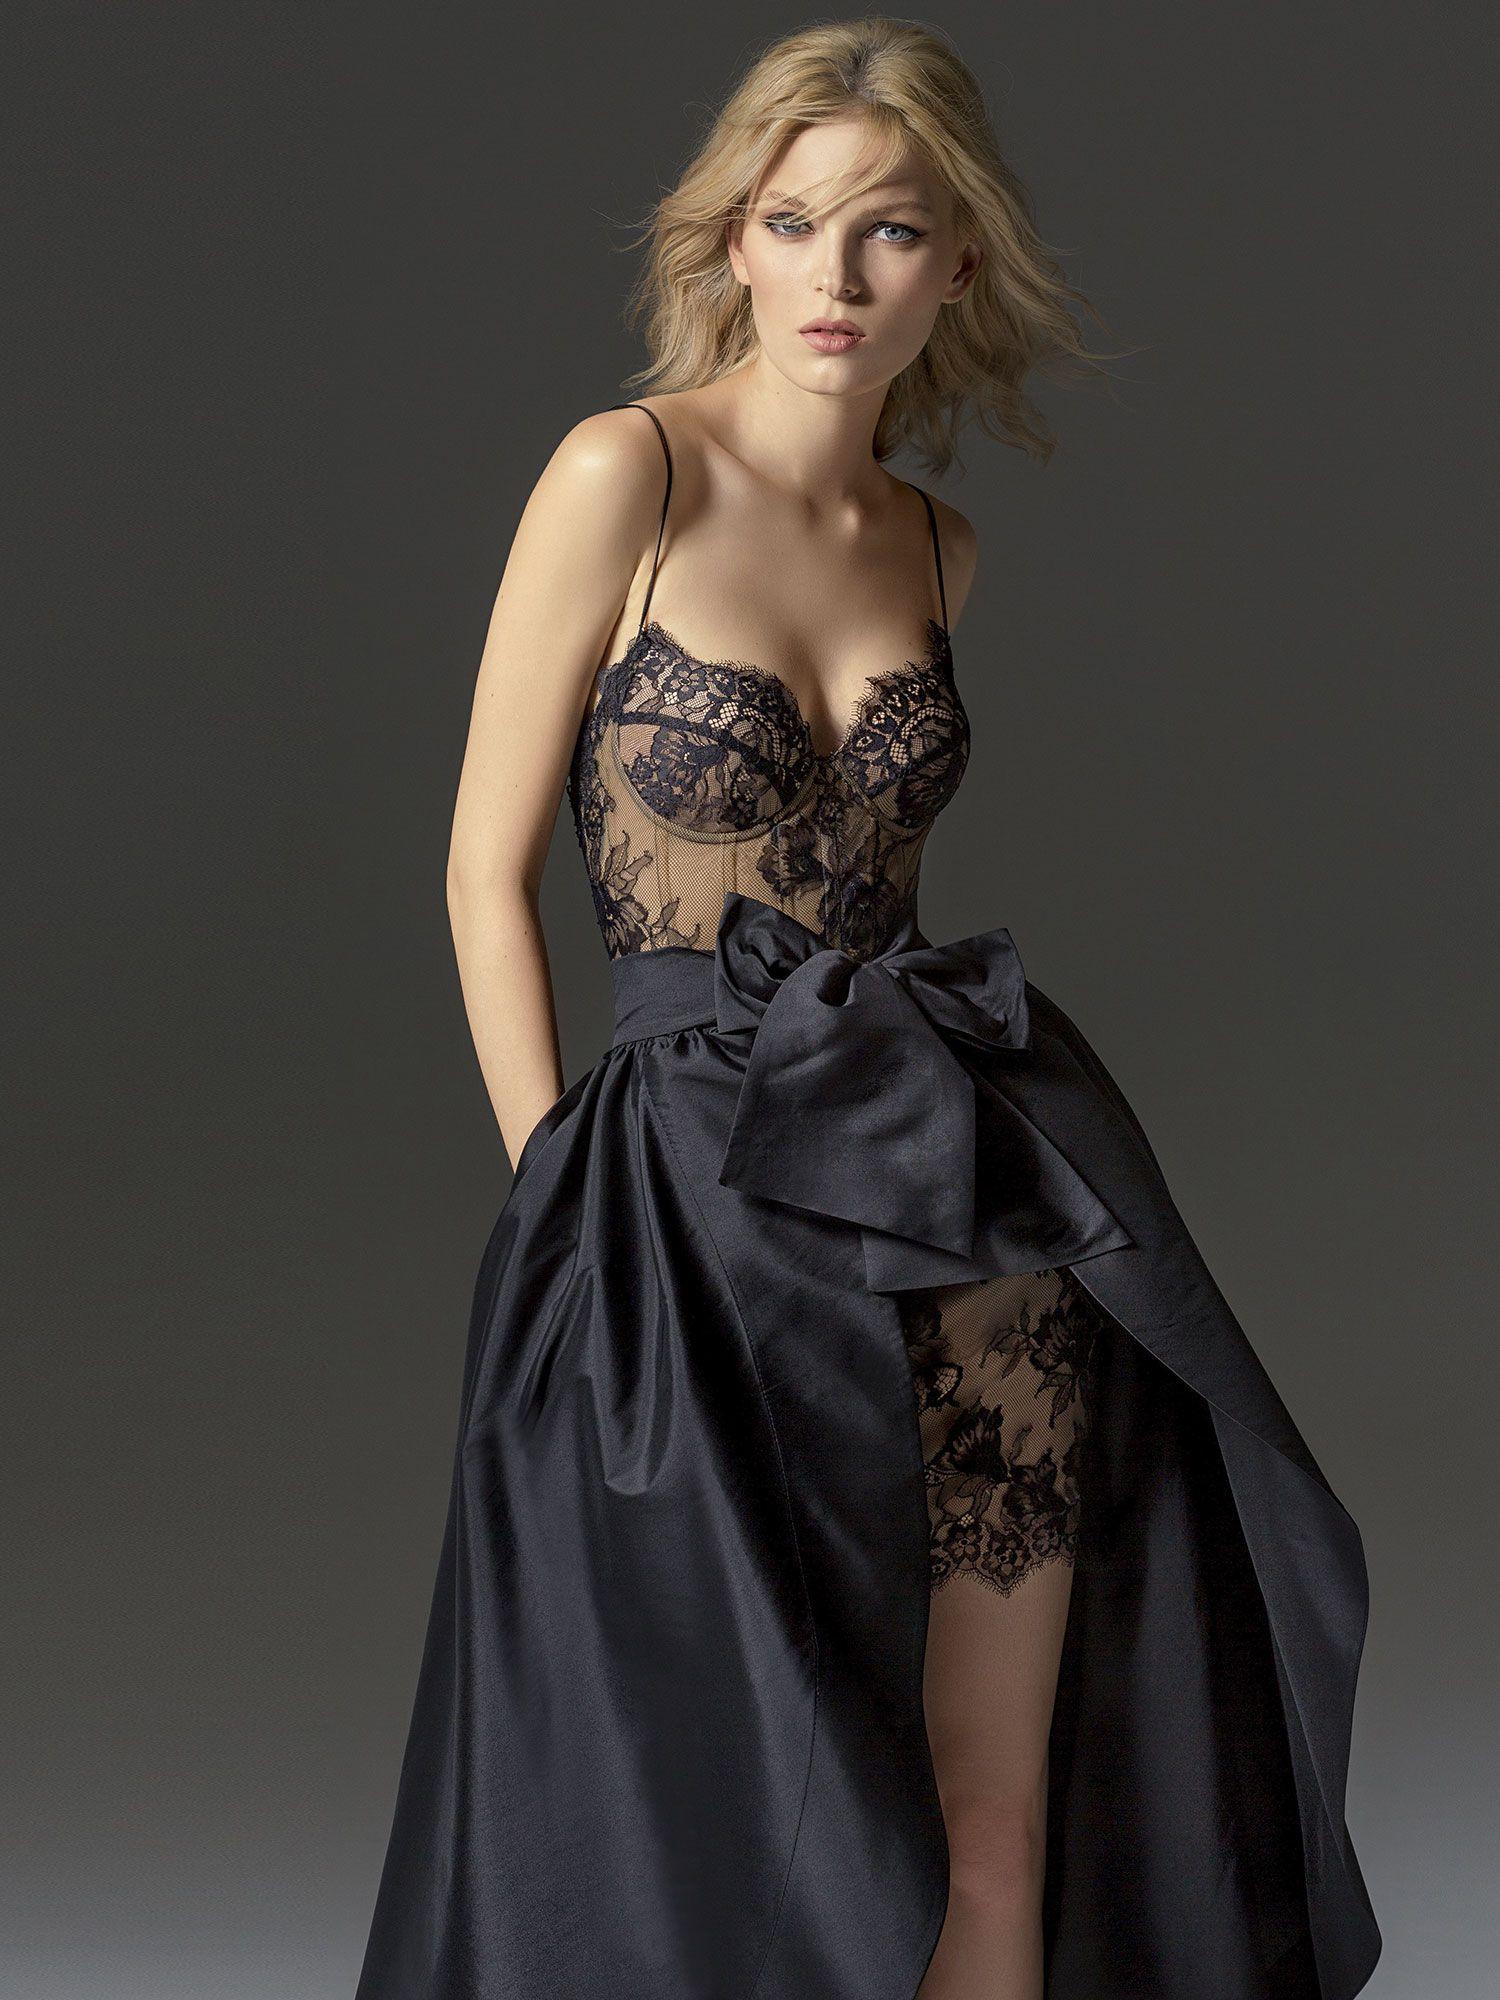 Short lace bustier dress with detachable black skirt